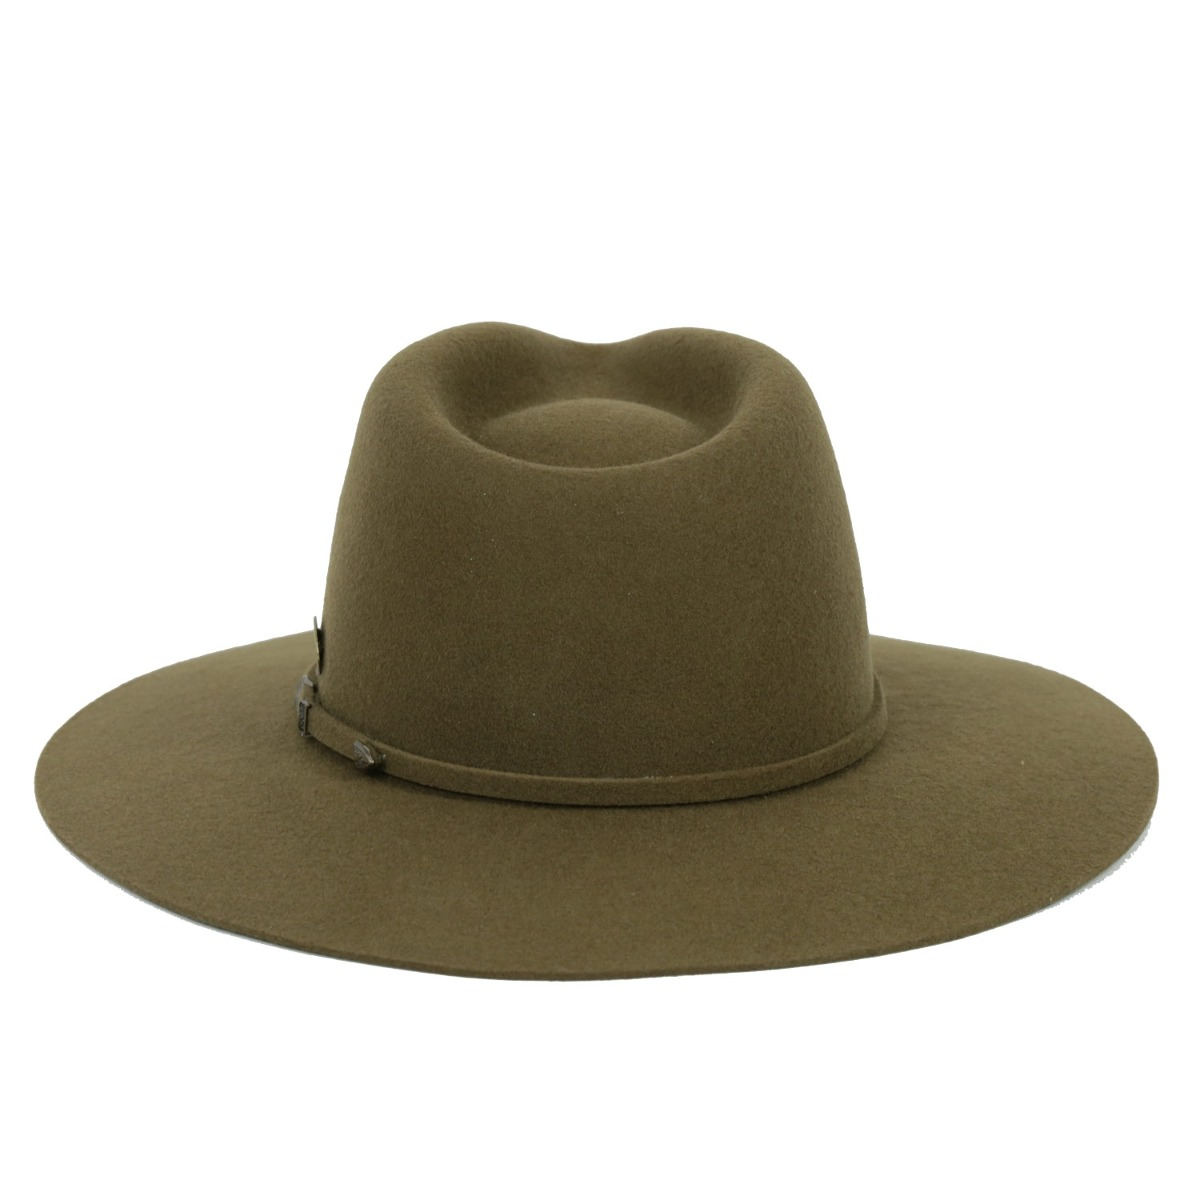 chapéu masculino aba 8cm feltro verde oliva. Carregando zoom. 83cd663fede